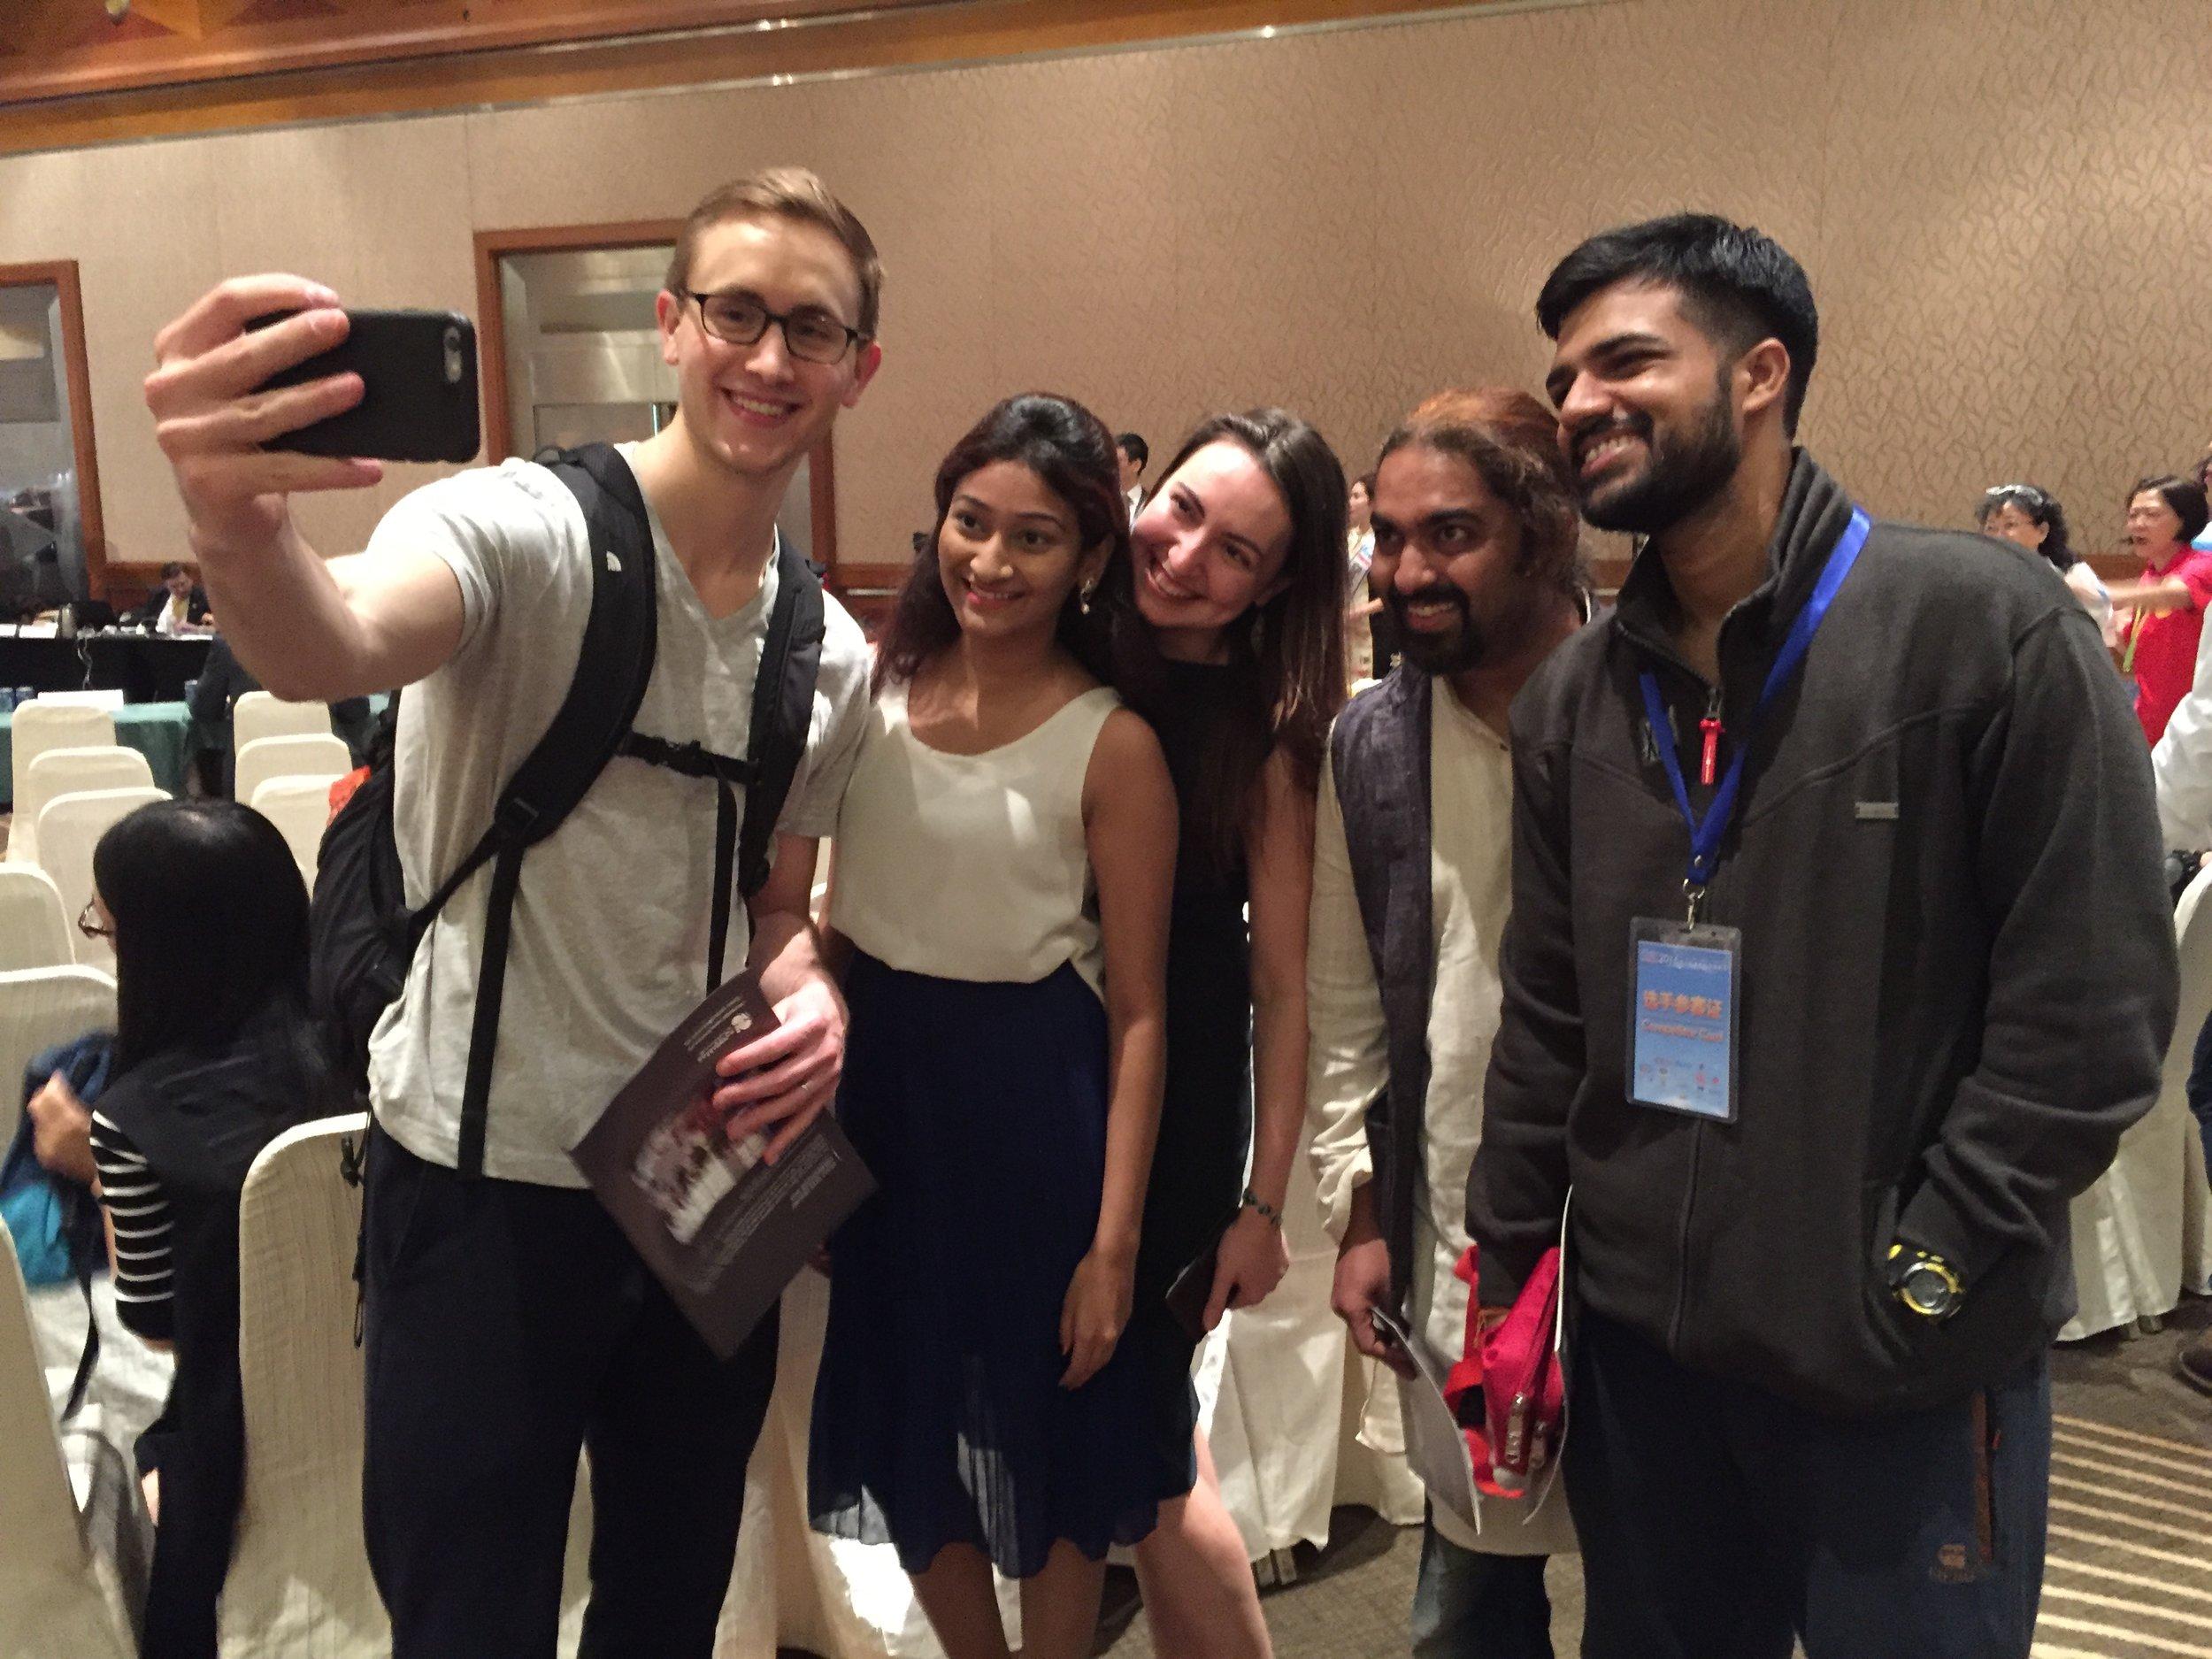 With Sri, Ekaterina, Omkar, and Prateek